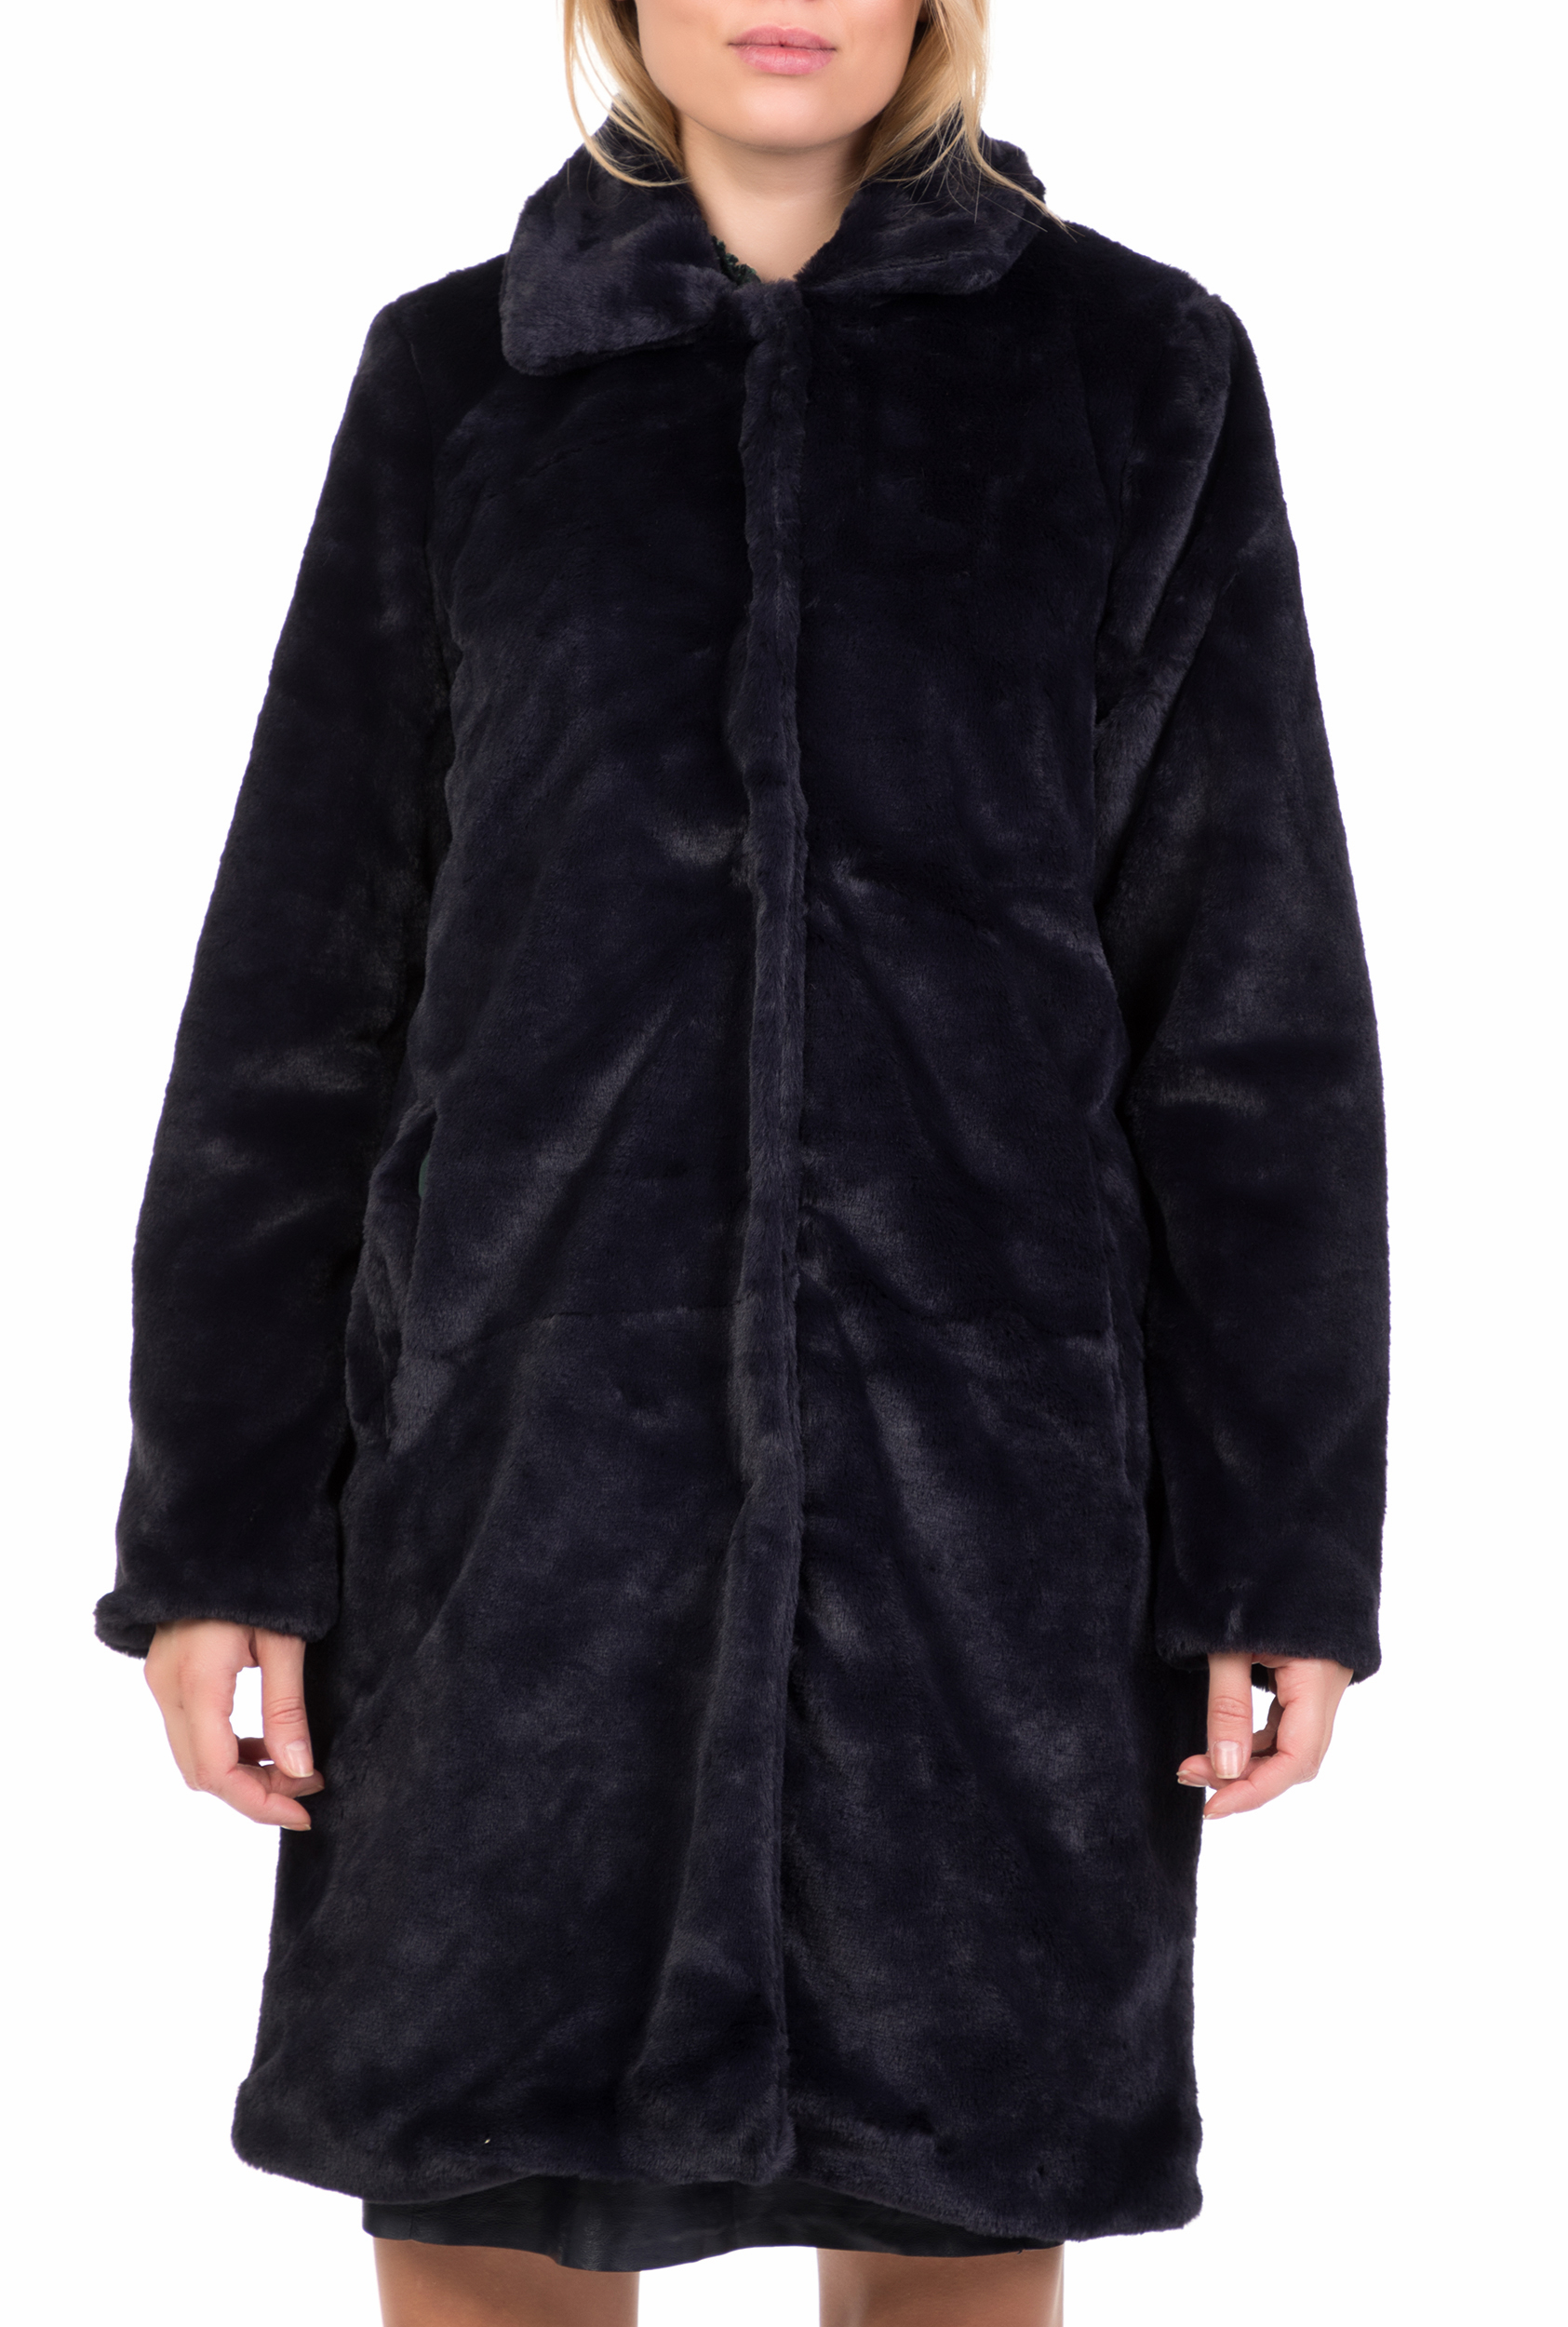 NUMPH - Γυναικείο παλτό ETAINA FUR NUMPH μπλε